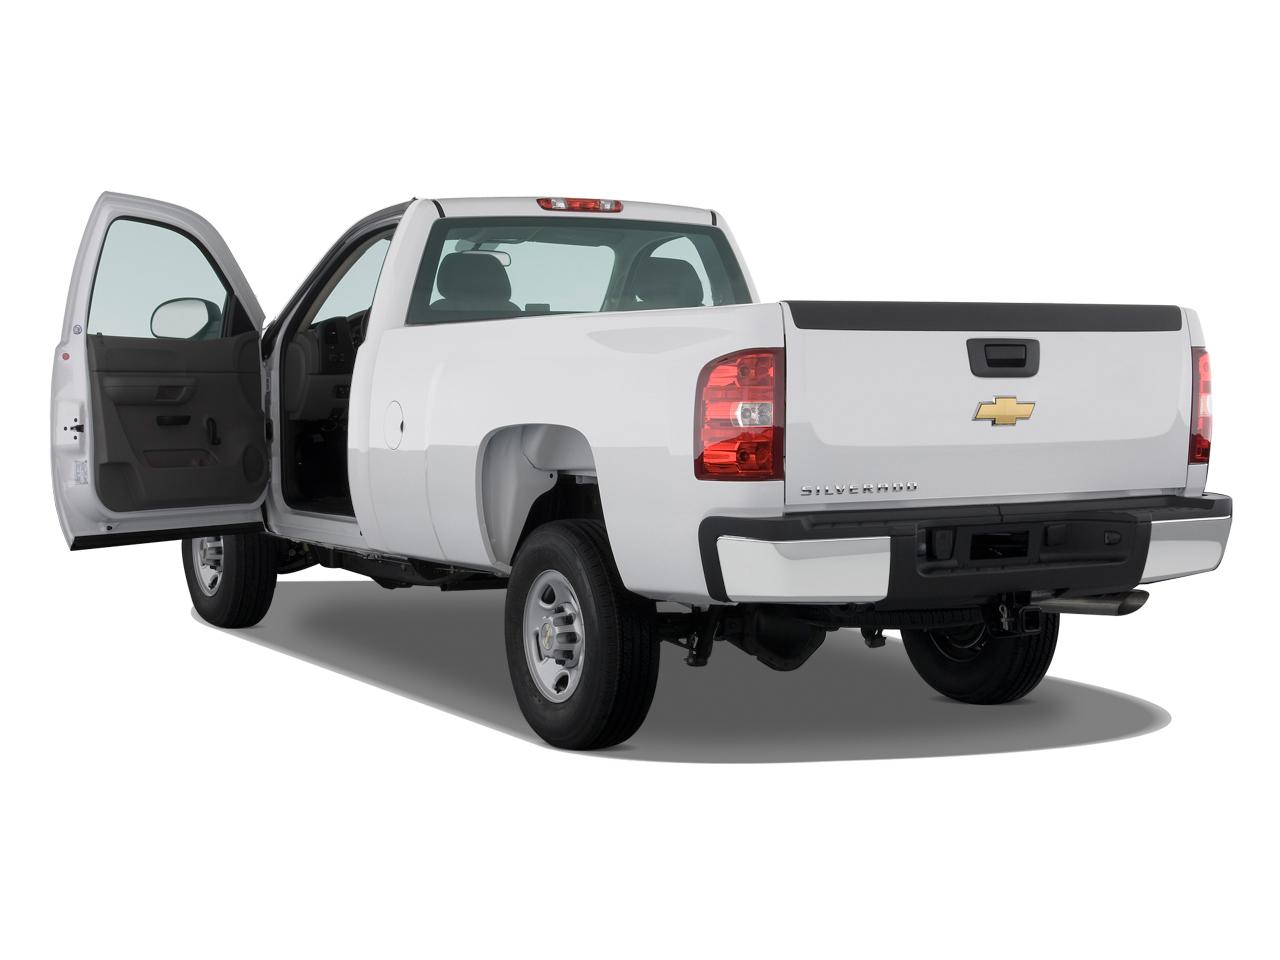 2009 chevrolet silverado hybrid chevy hybrid pickup truck review automobile magazine. Black Bedroom Furniture Sets. Home Design Ideas